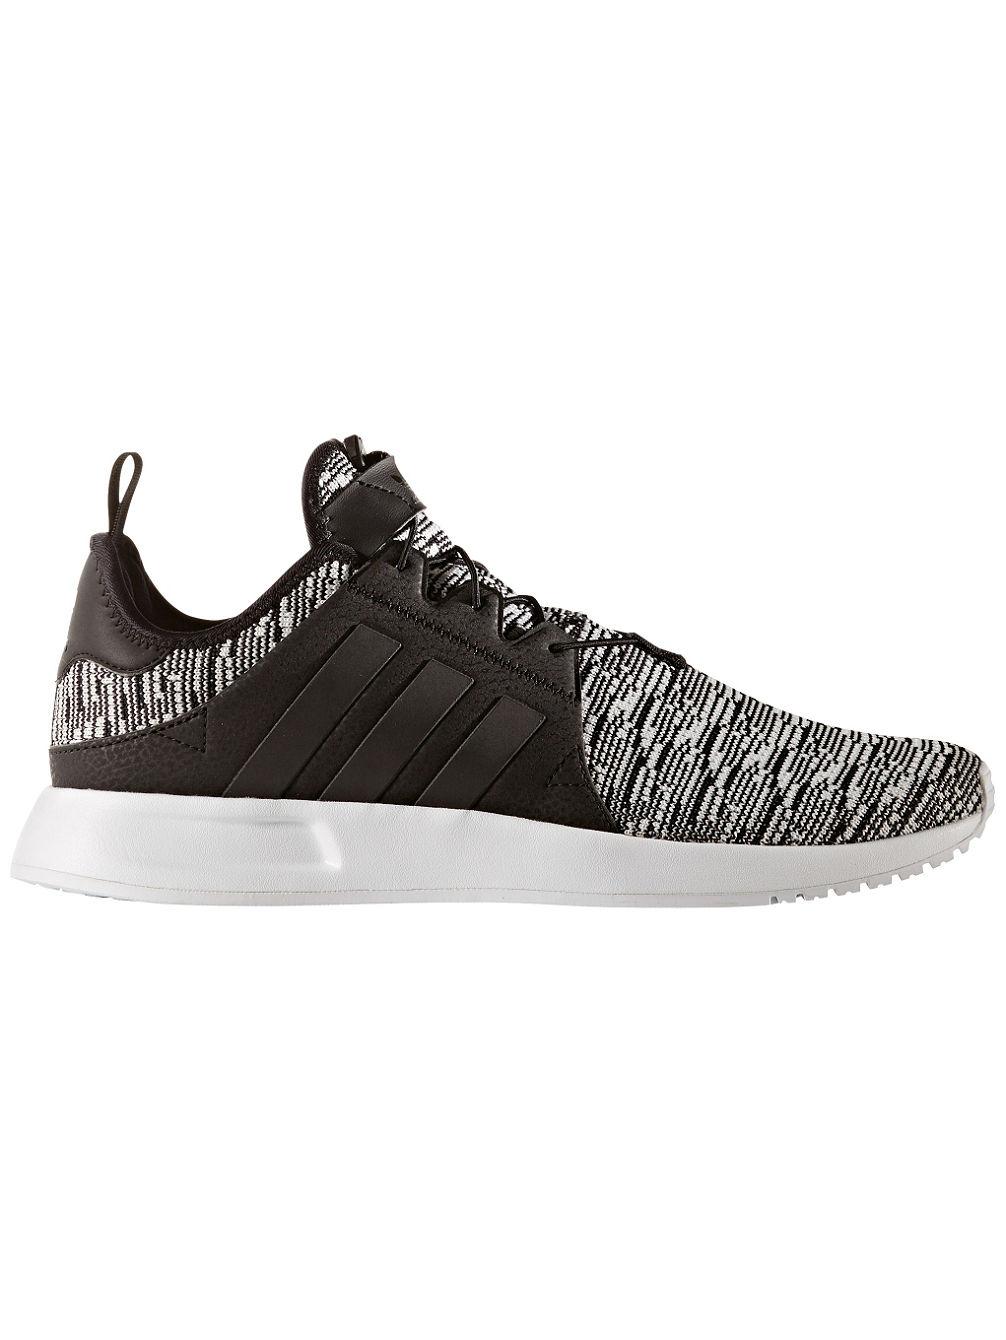 c9dd8f5cb41 Buy adidas Originals X PLR Sneakers online at blue-tomato.com